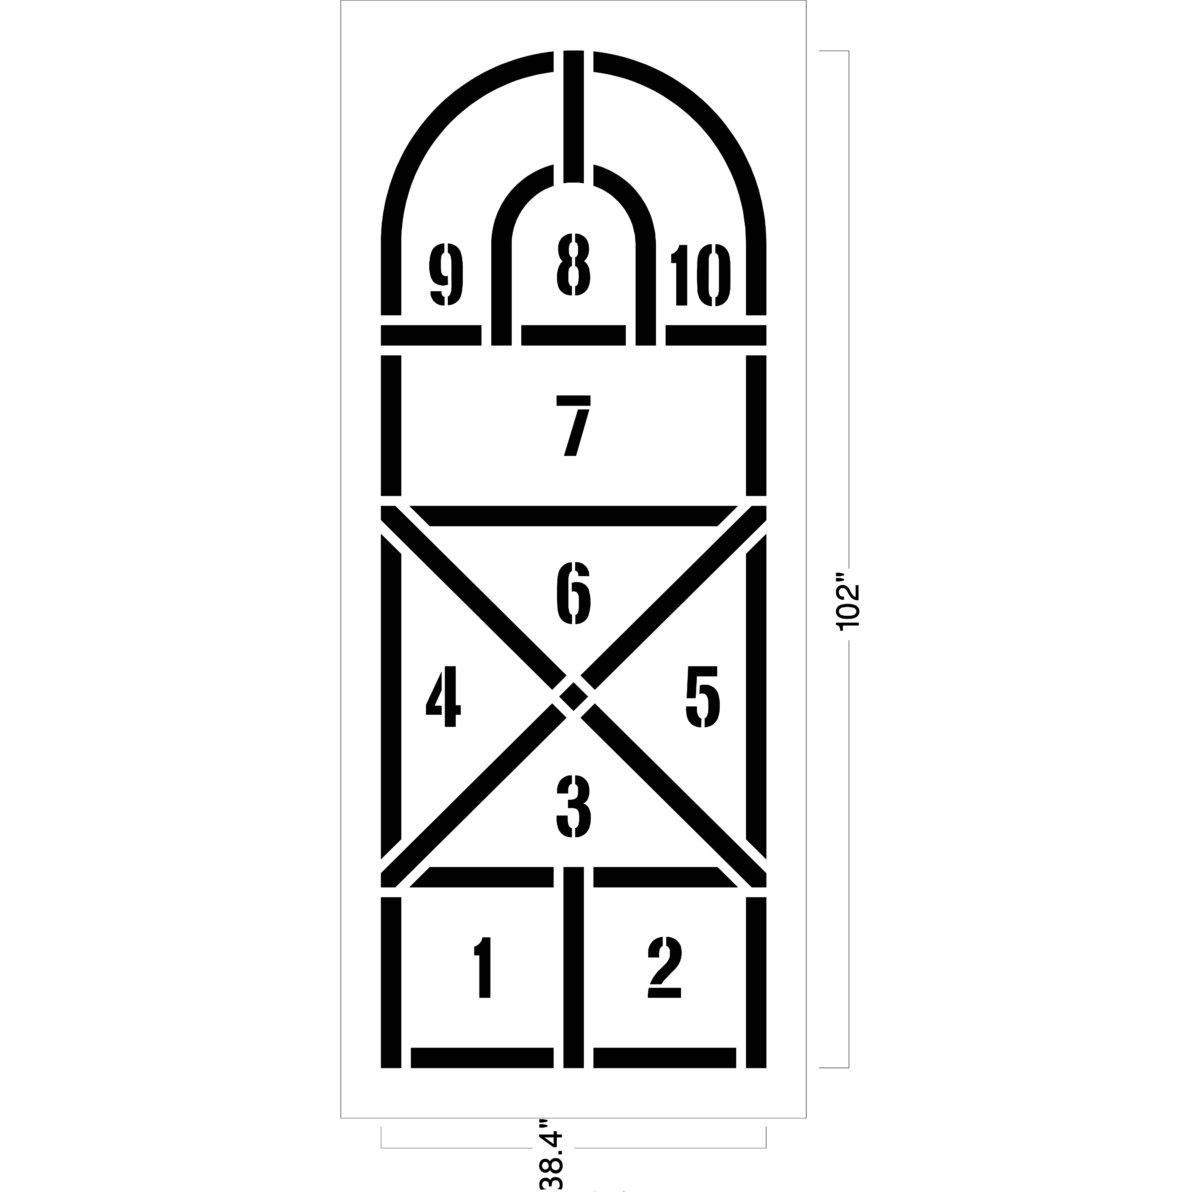 Arched hopscotch